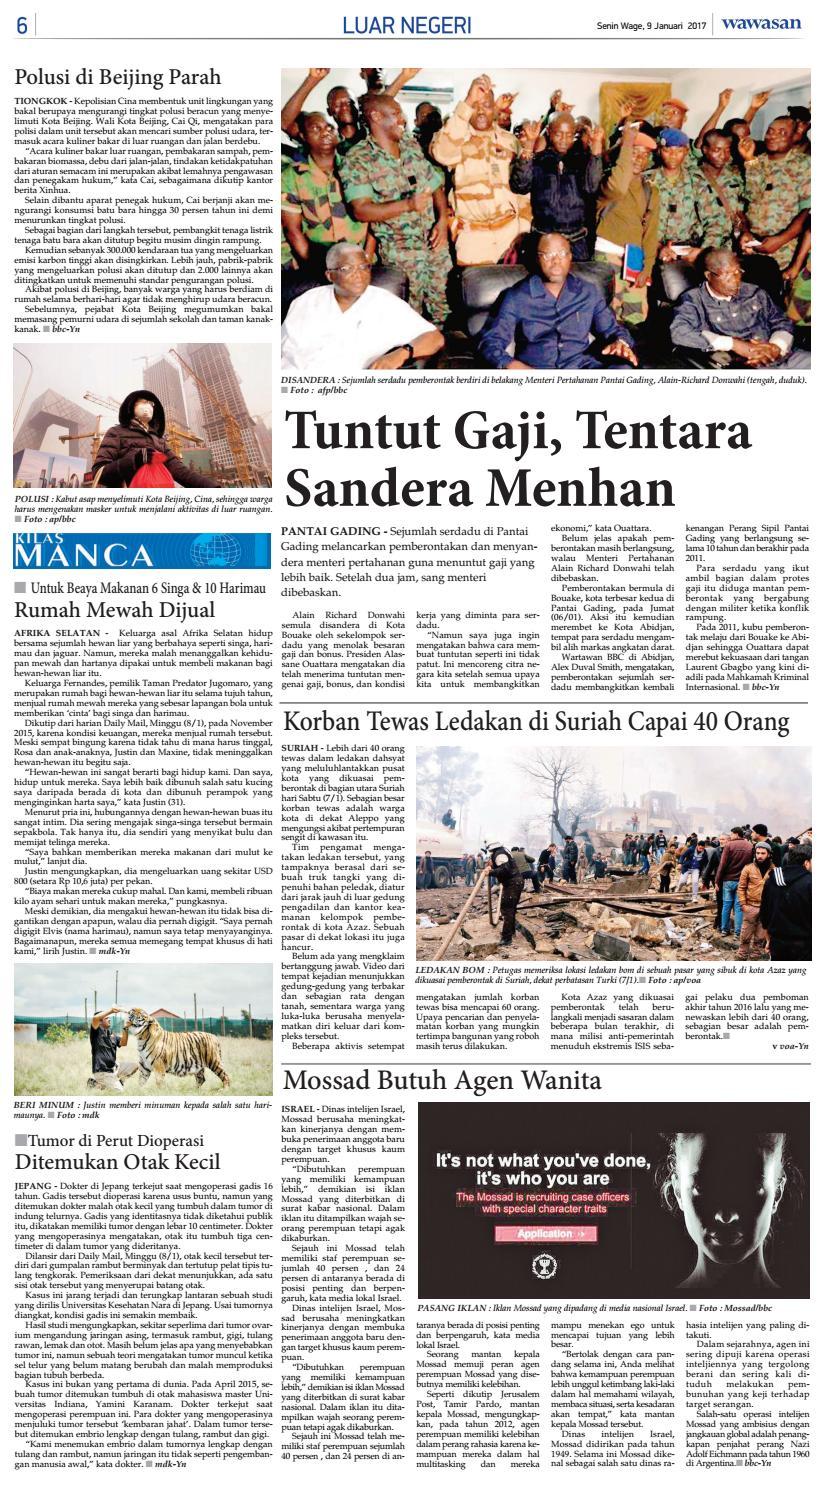 Wawasan 09 Januari 2017 By Koran Pagi Wawasan Issuu